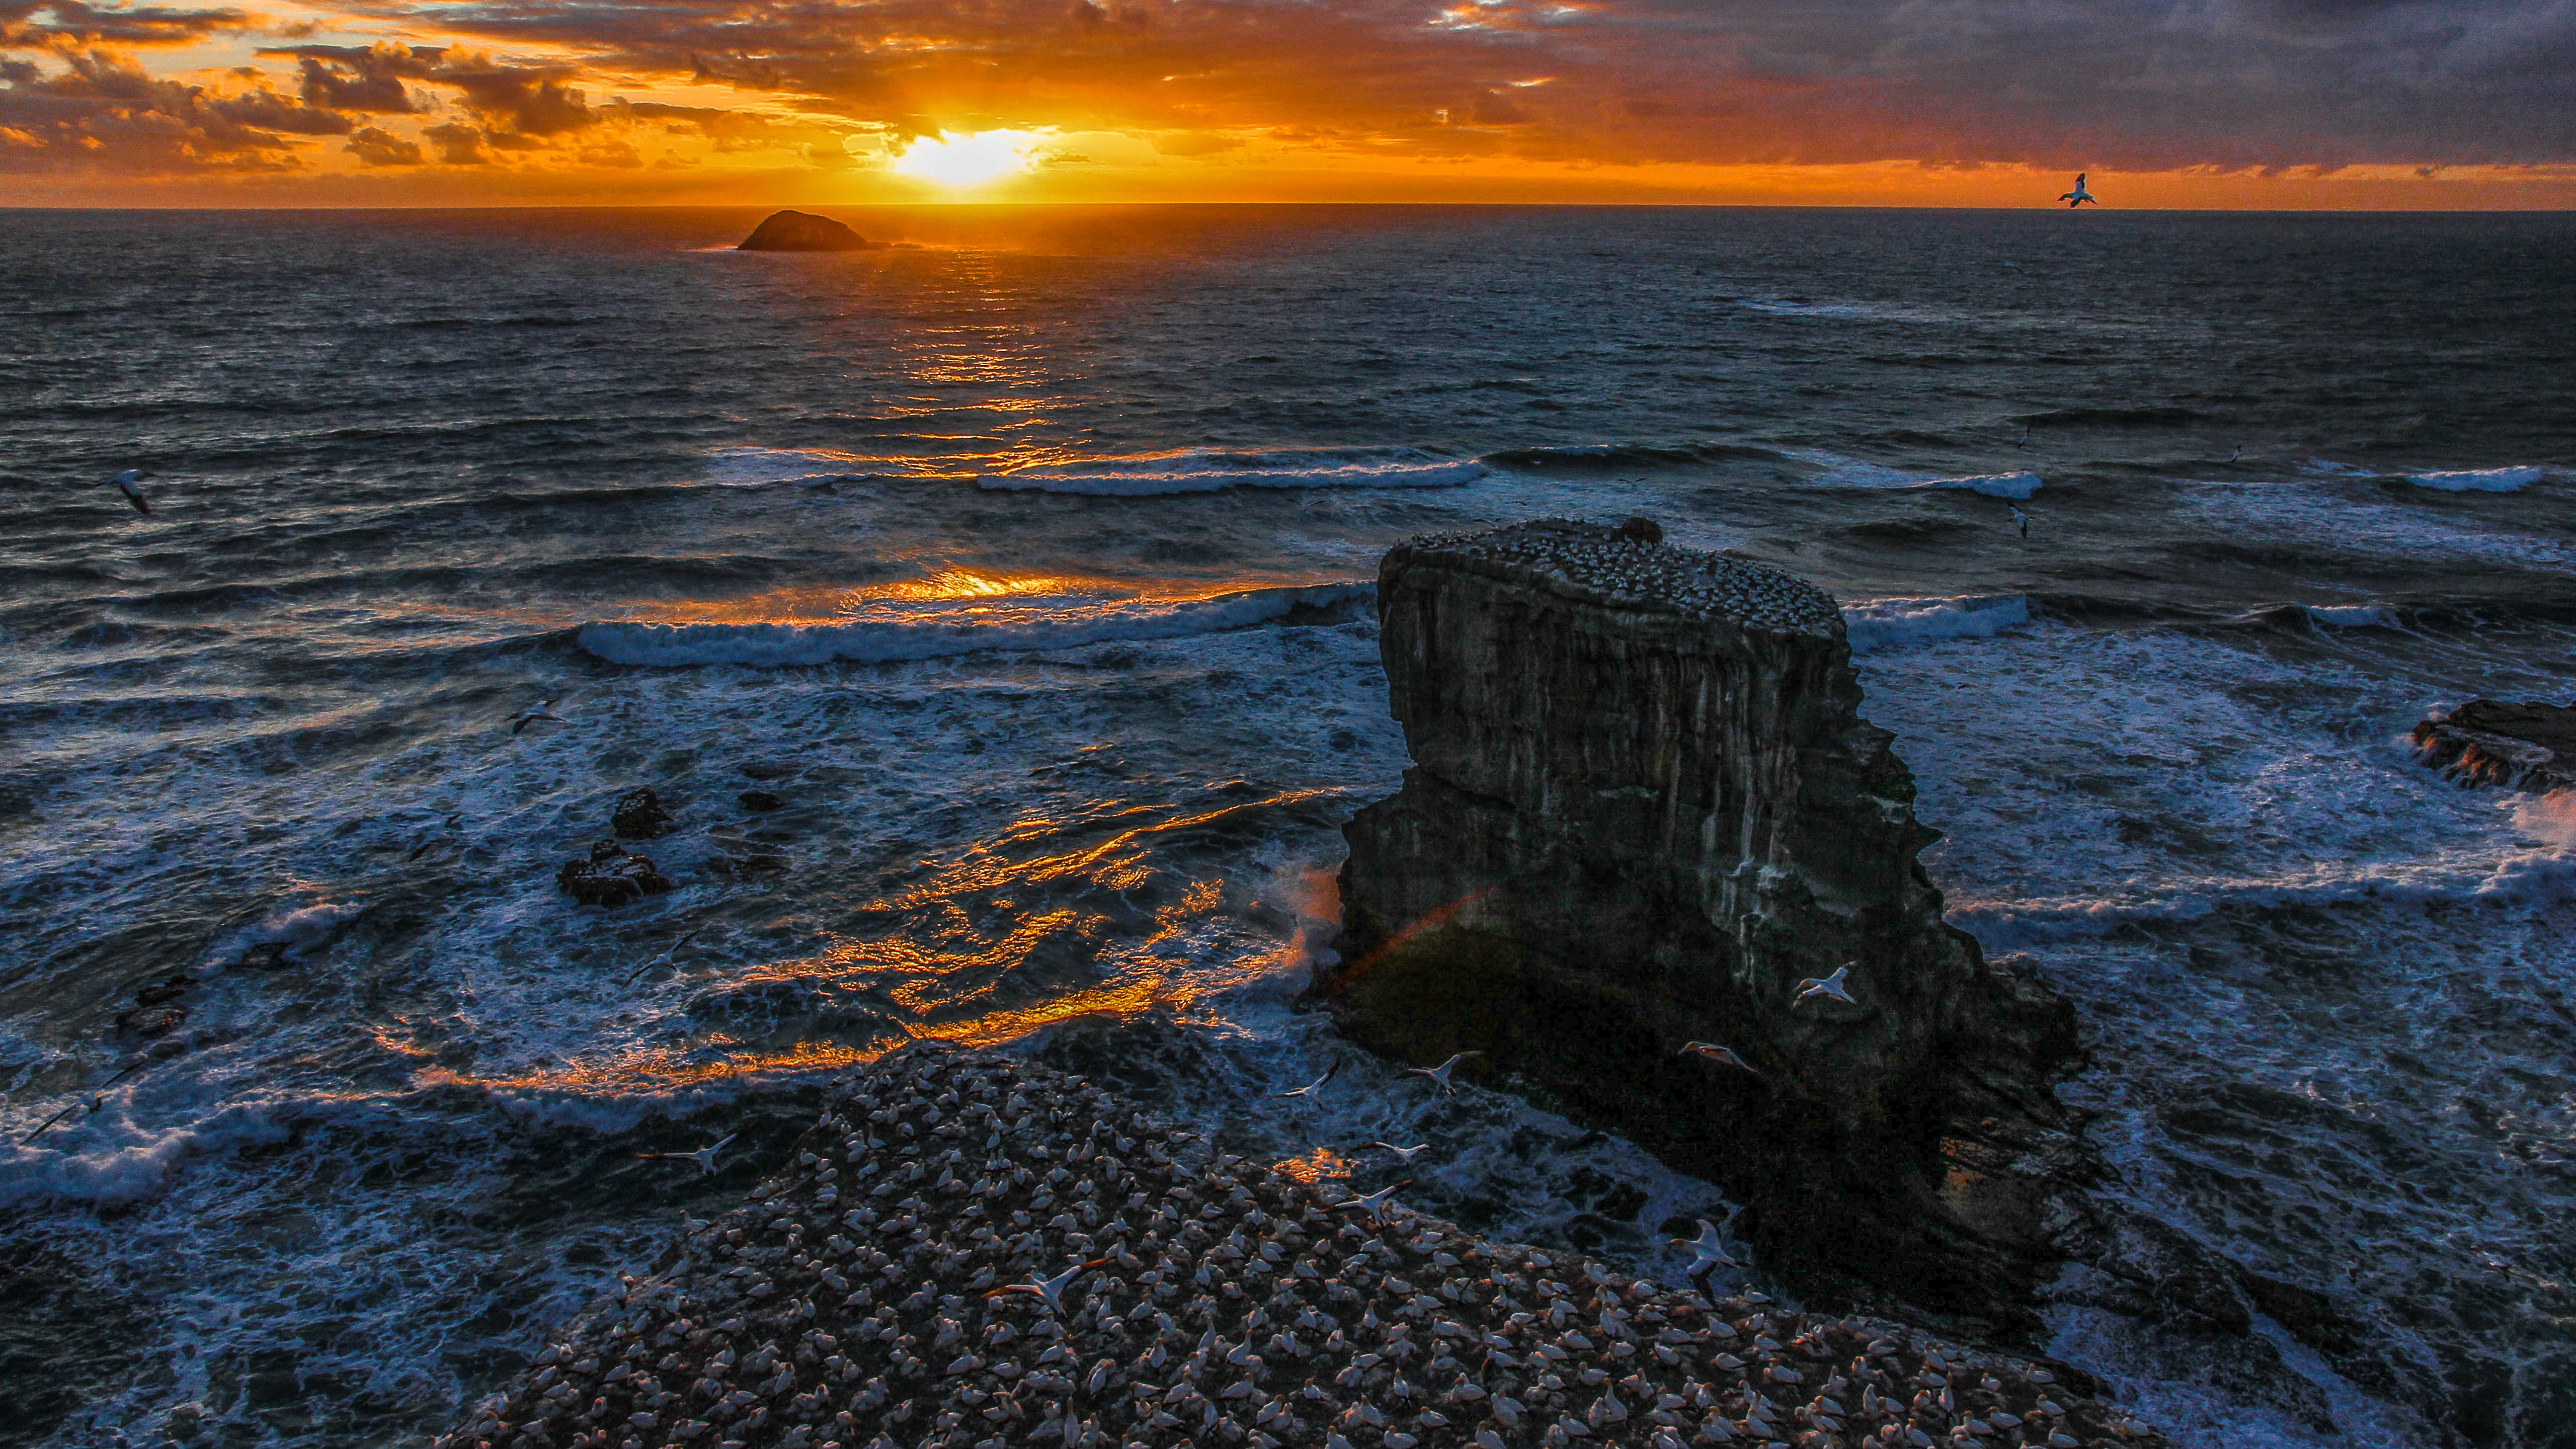 NZ Auckland Muriwai Gannet Colony Sunset 07-1 (2).jpg